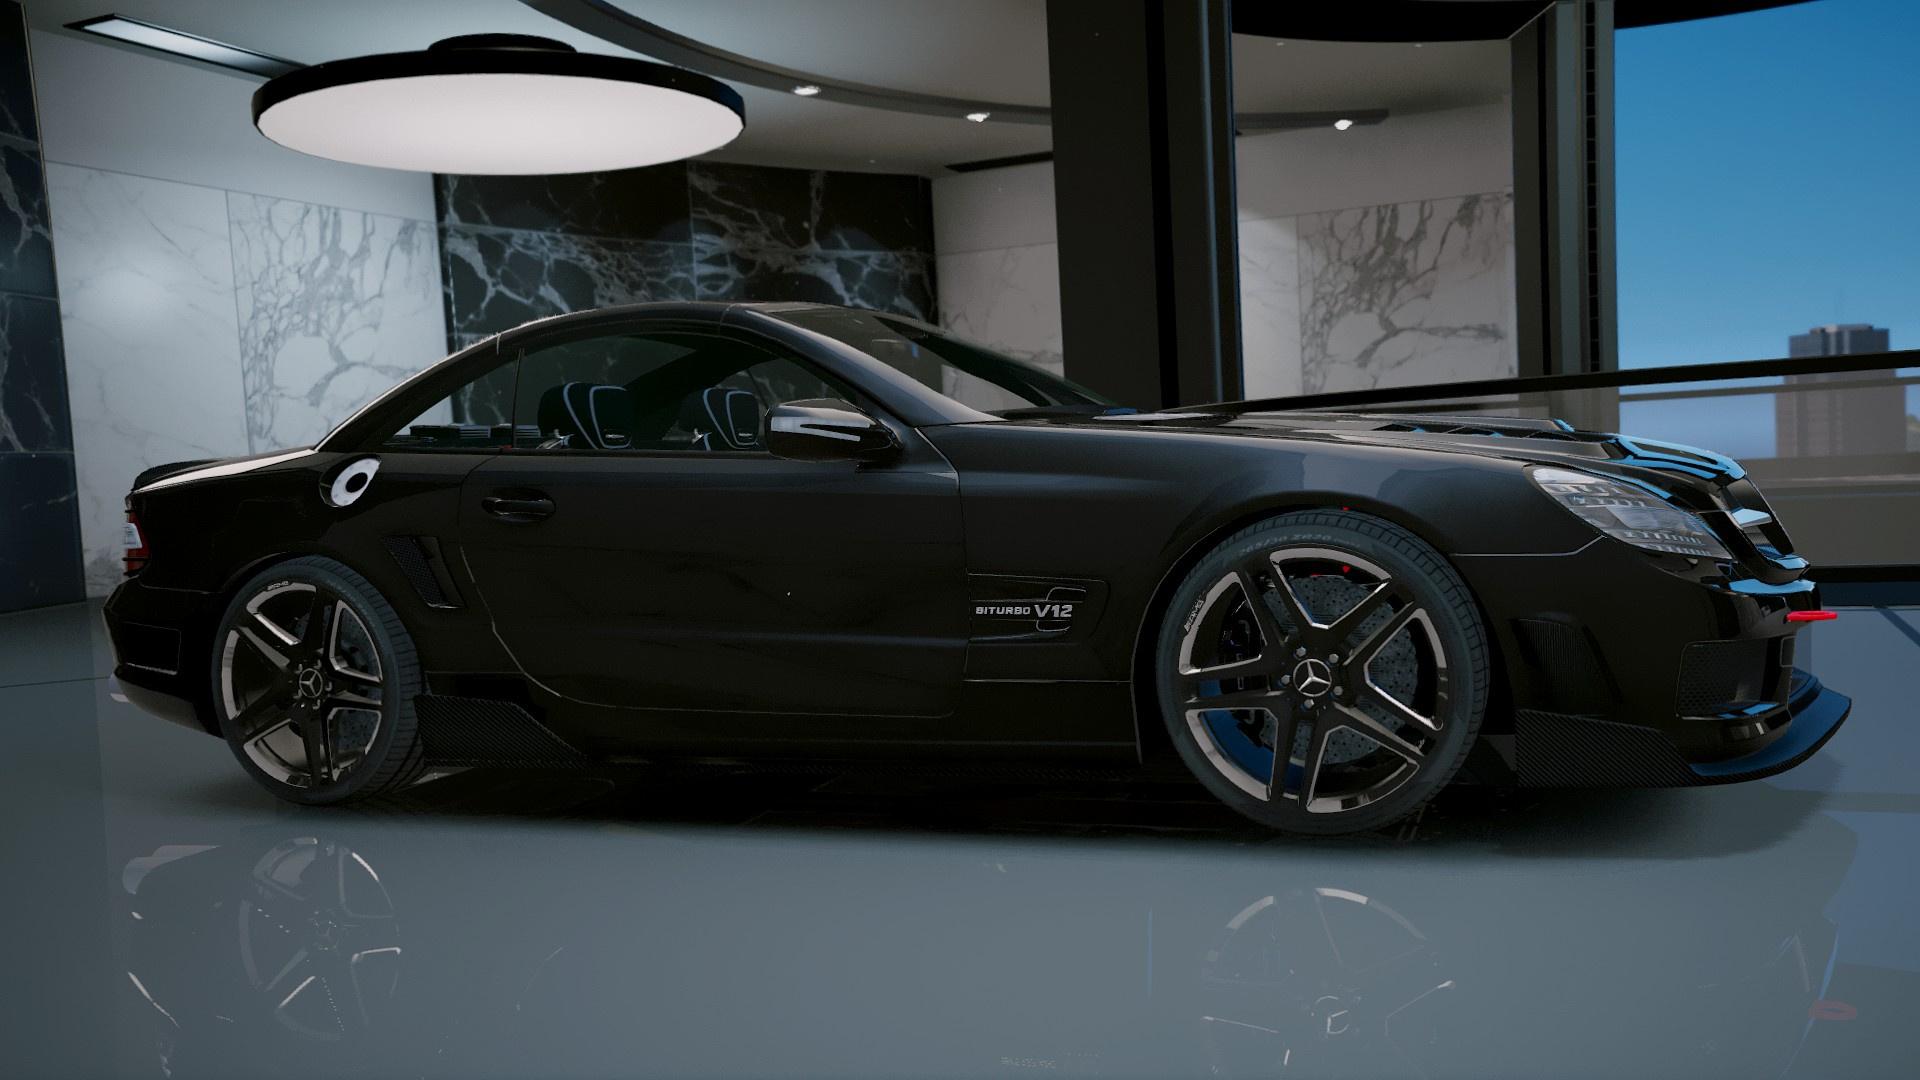 deb8e2-GTA5Mod_Mercedes-BenzSLAMG_RmodCu